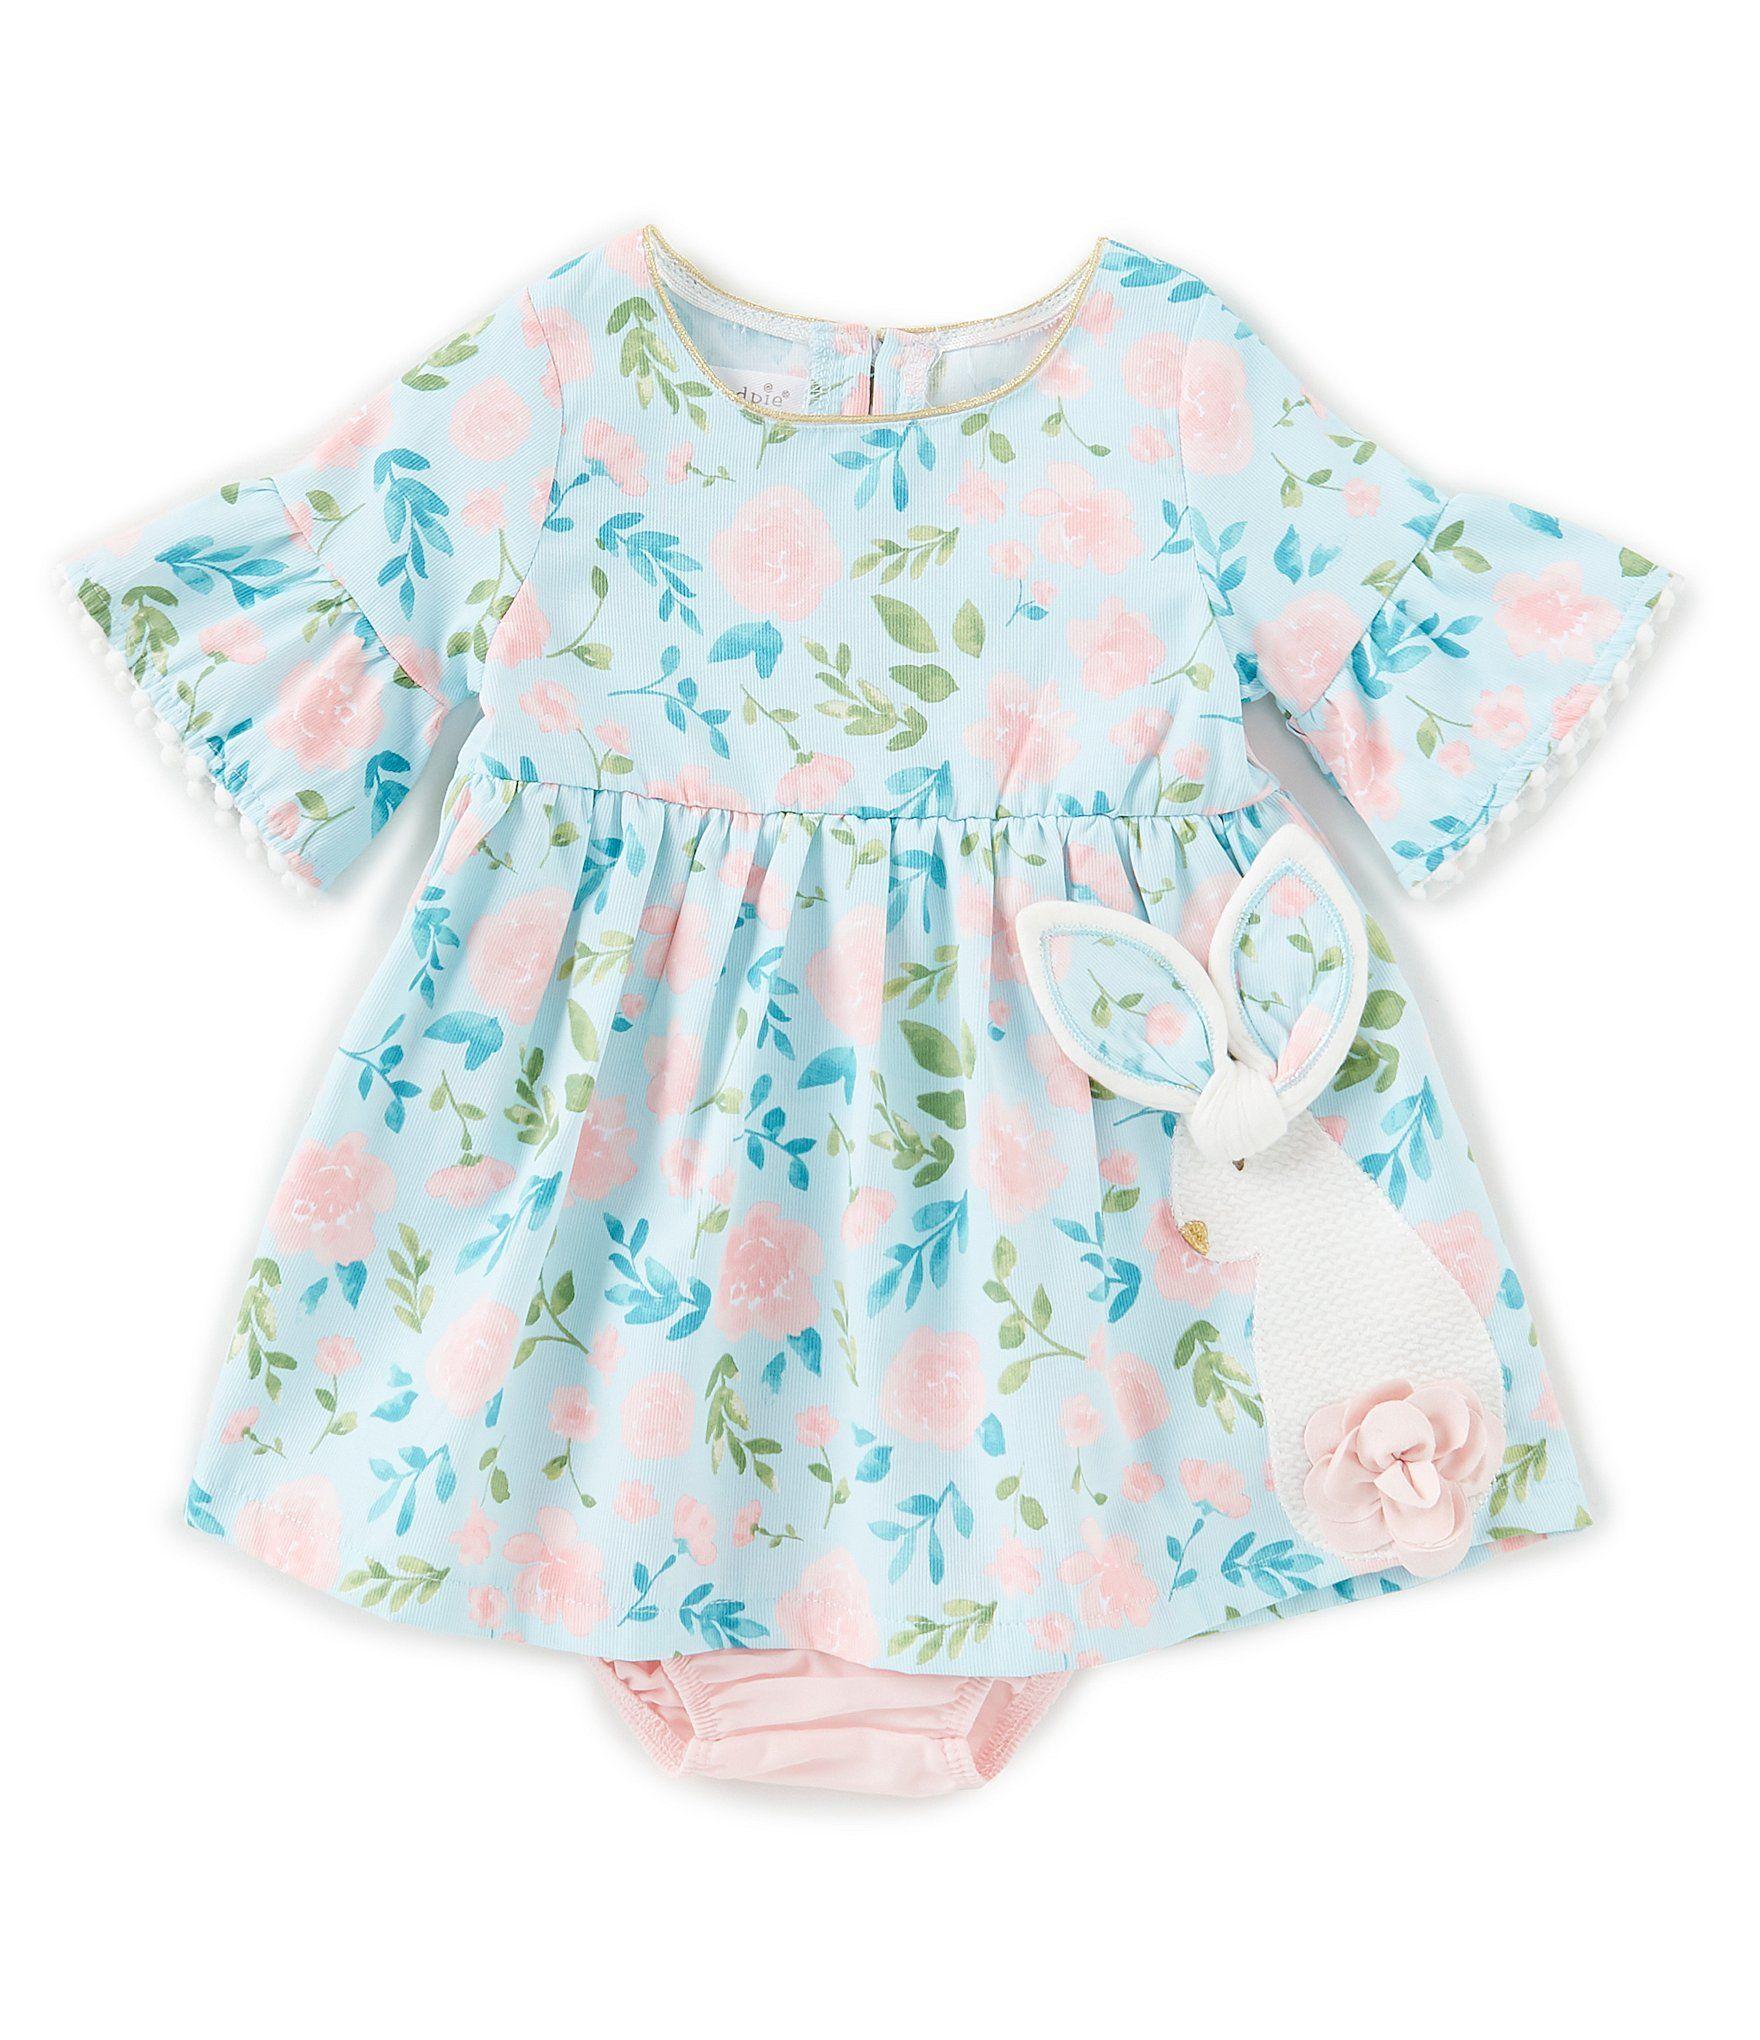 Baby Clothes Romper Rockabilly Unicorn Mermaid blue Girl Baby Bodysuit white rose onesie